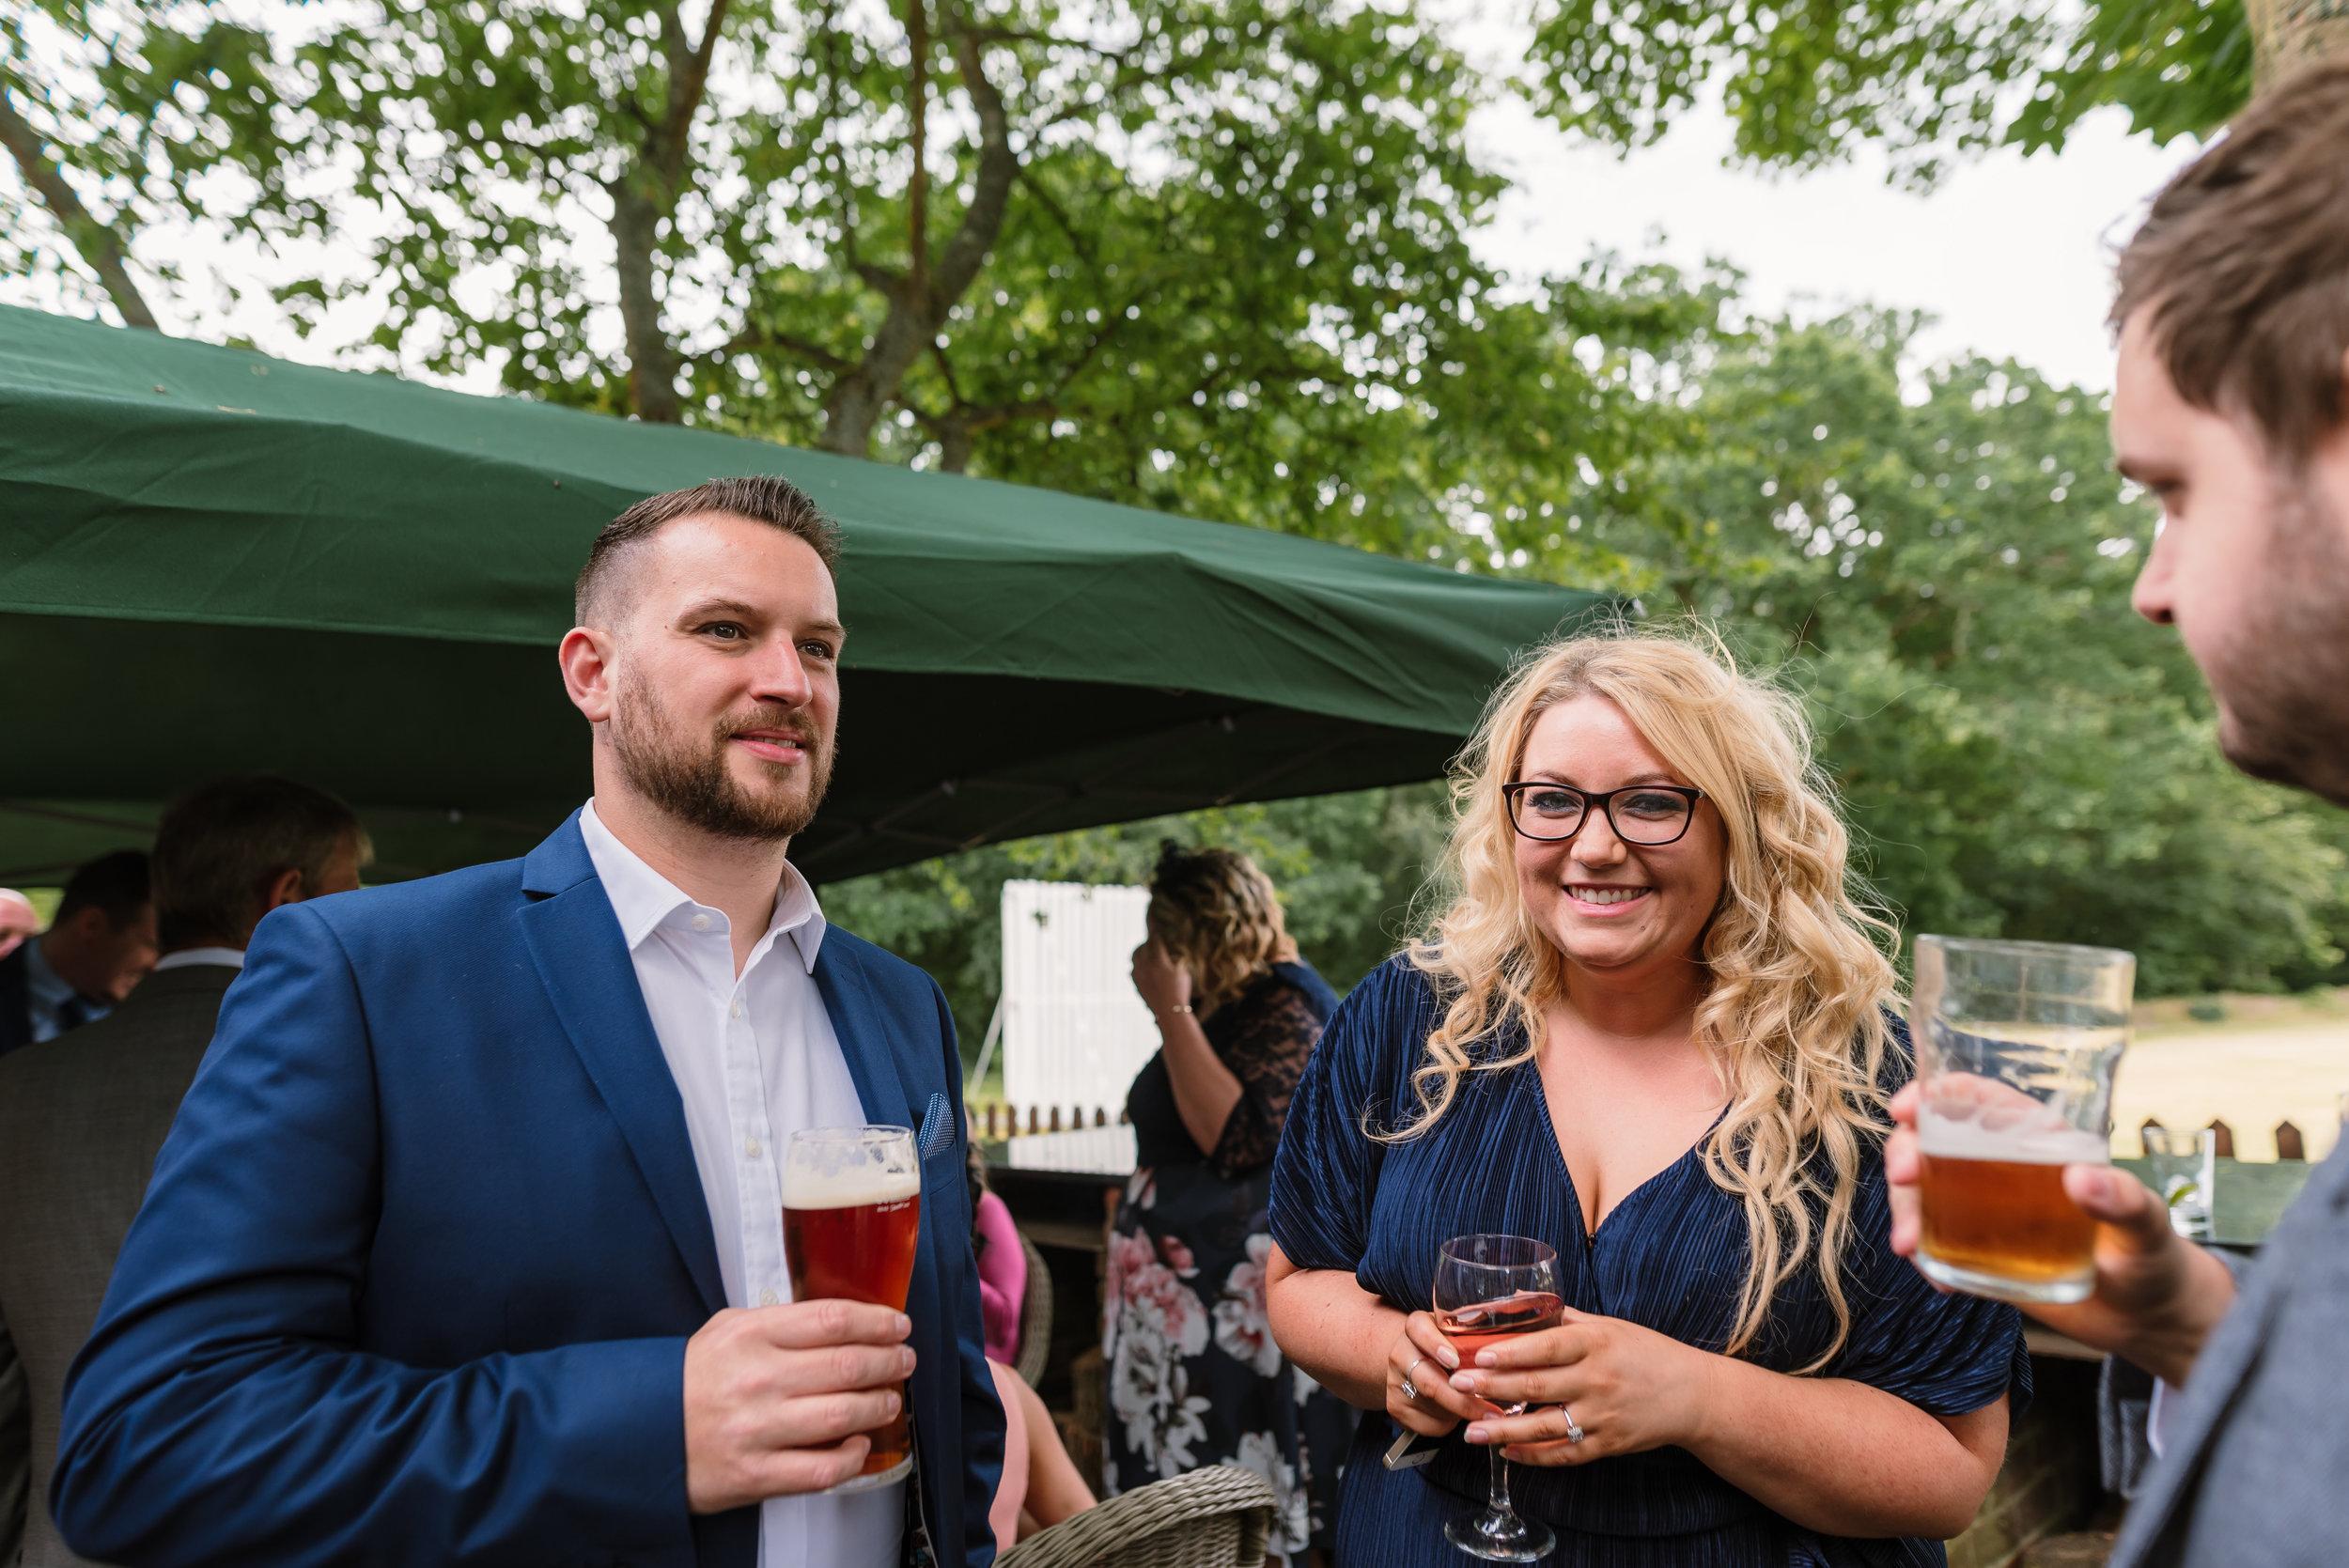 Sarah-Fishlock-Photography : Hampshire-wedding-photographer-hampshire : fleet-wedding-photographer-fleet : Meade-Hall-Wedding-Photographer : Meade-Hall-Wedding-Photos-654.jpg